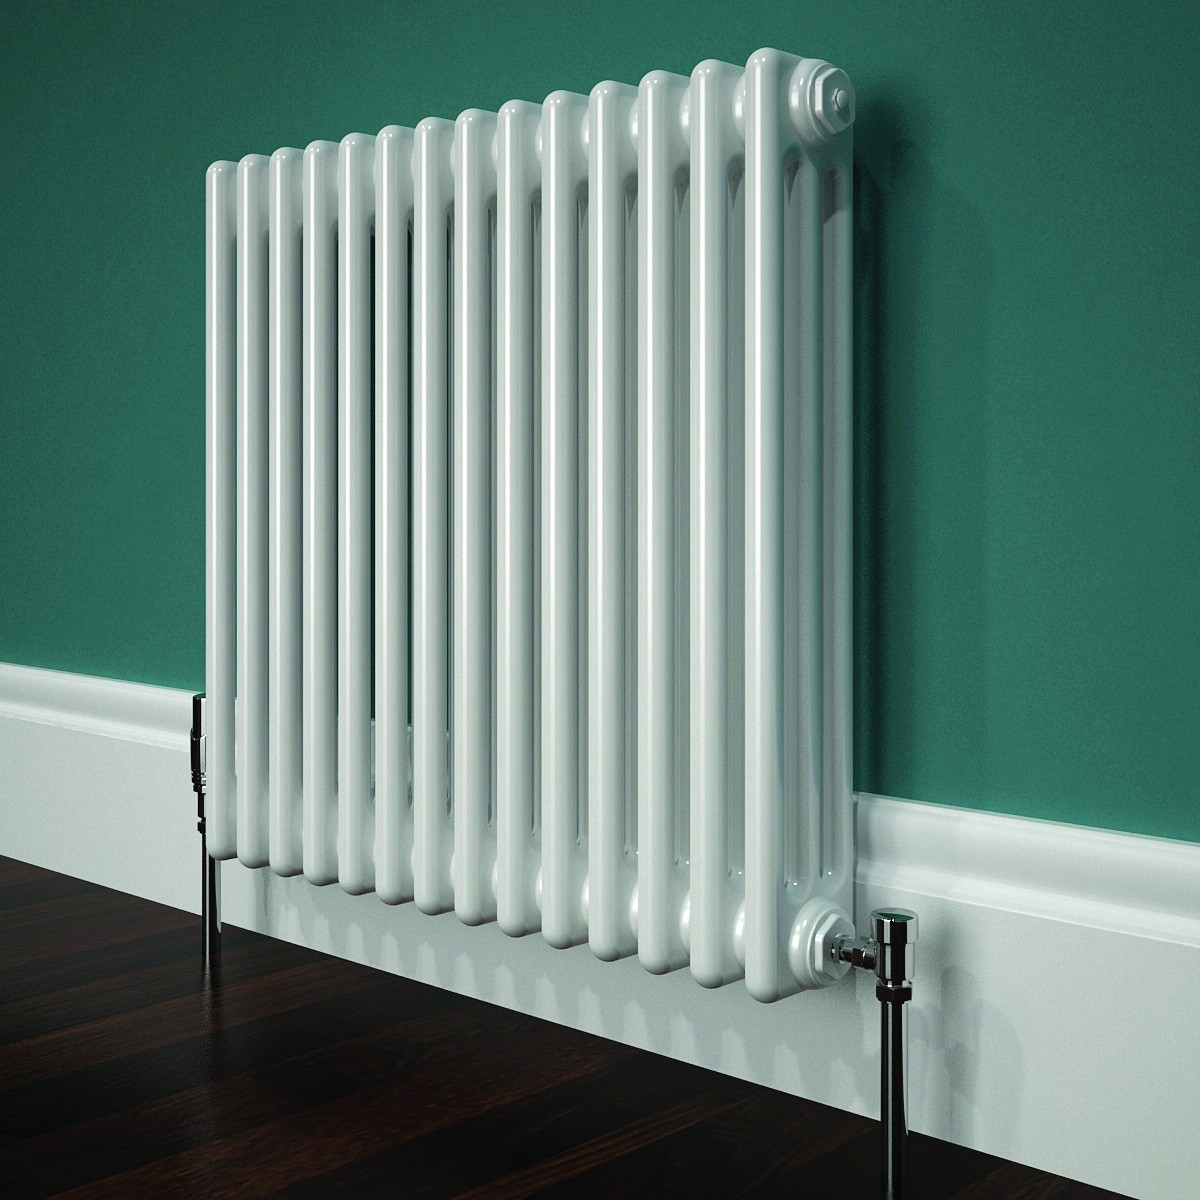 Stelrad white horizonal column radiator